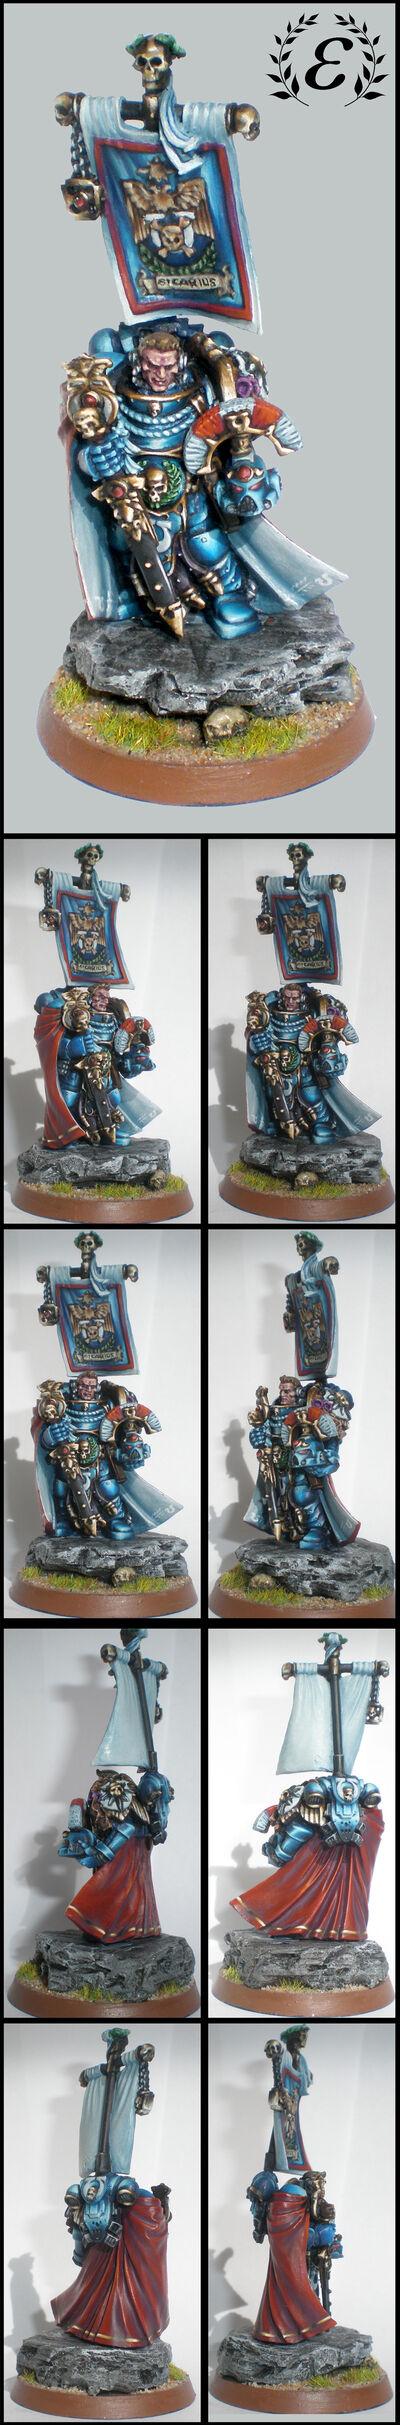 Capitán Cato Sicarius I